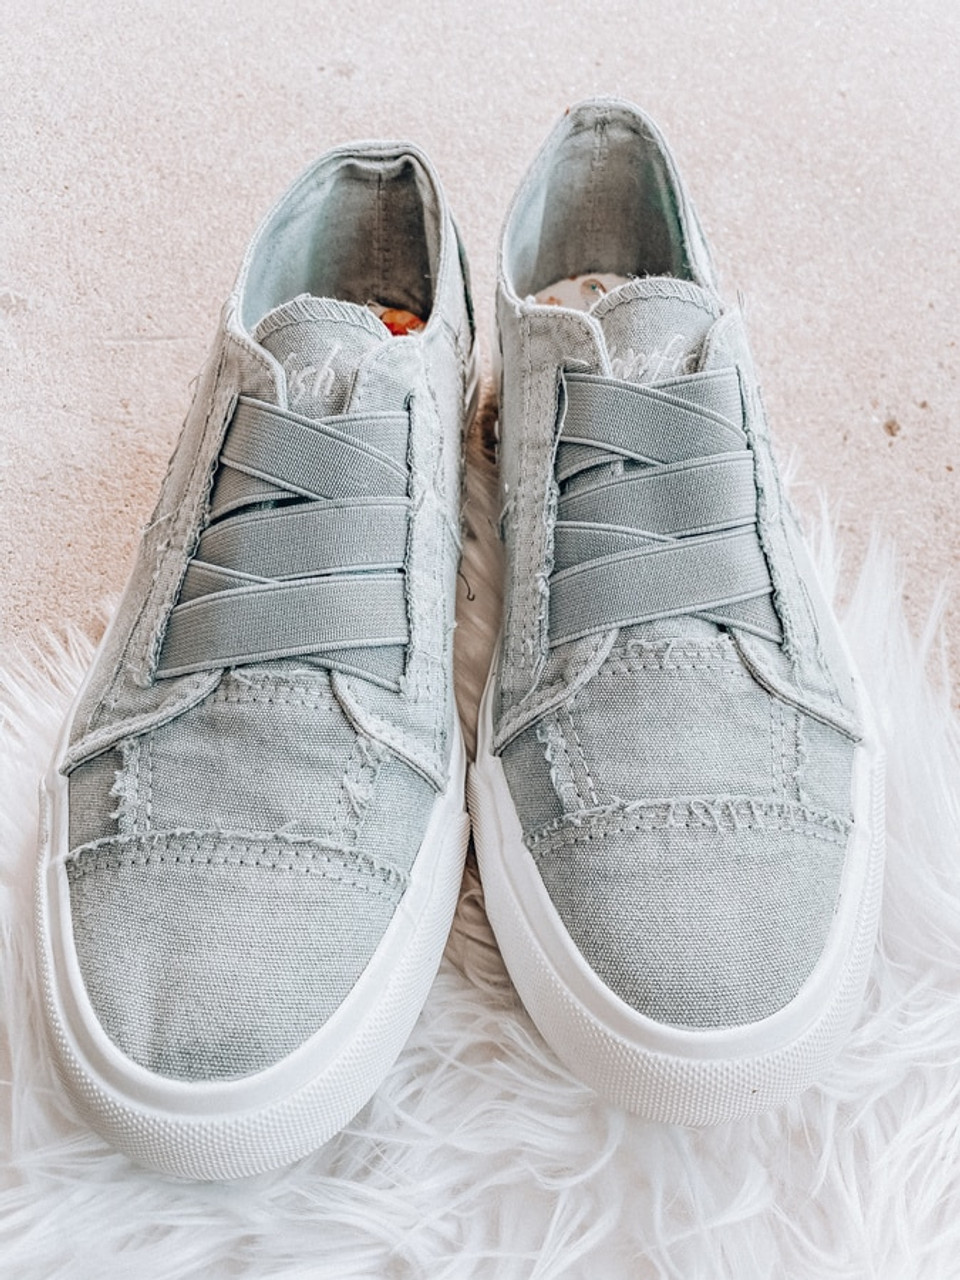 Blowfish Marley: Sweet Grey free shipping